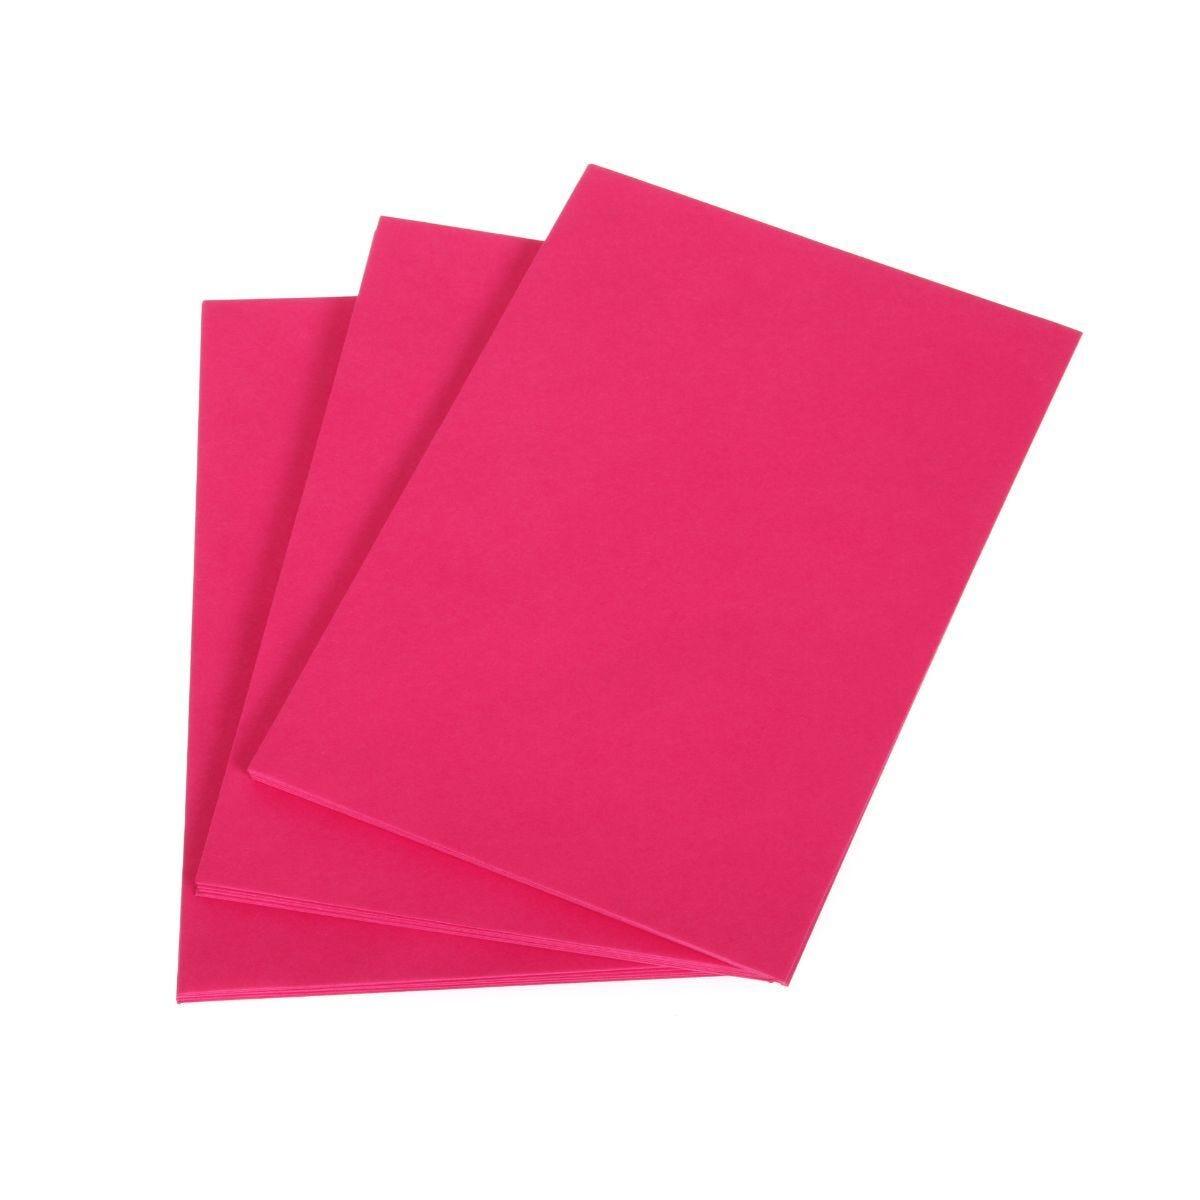 Ryman Envelopes C5 229x162mm 100gsm Pack of 20